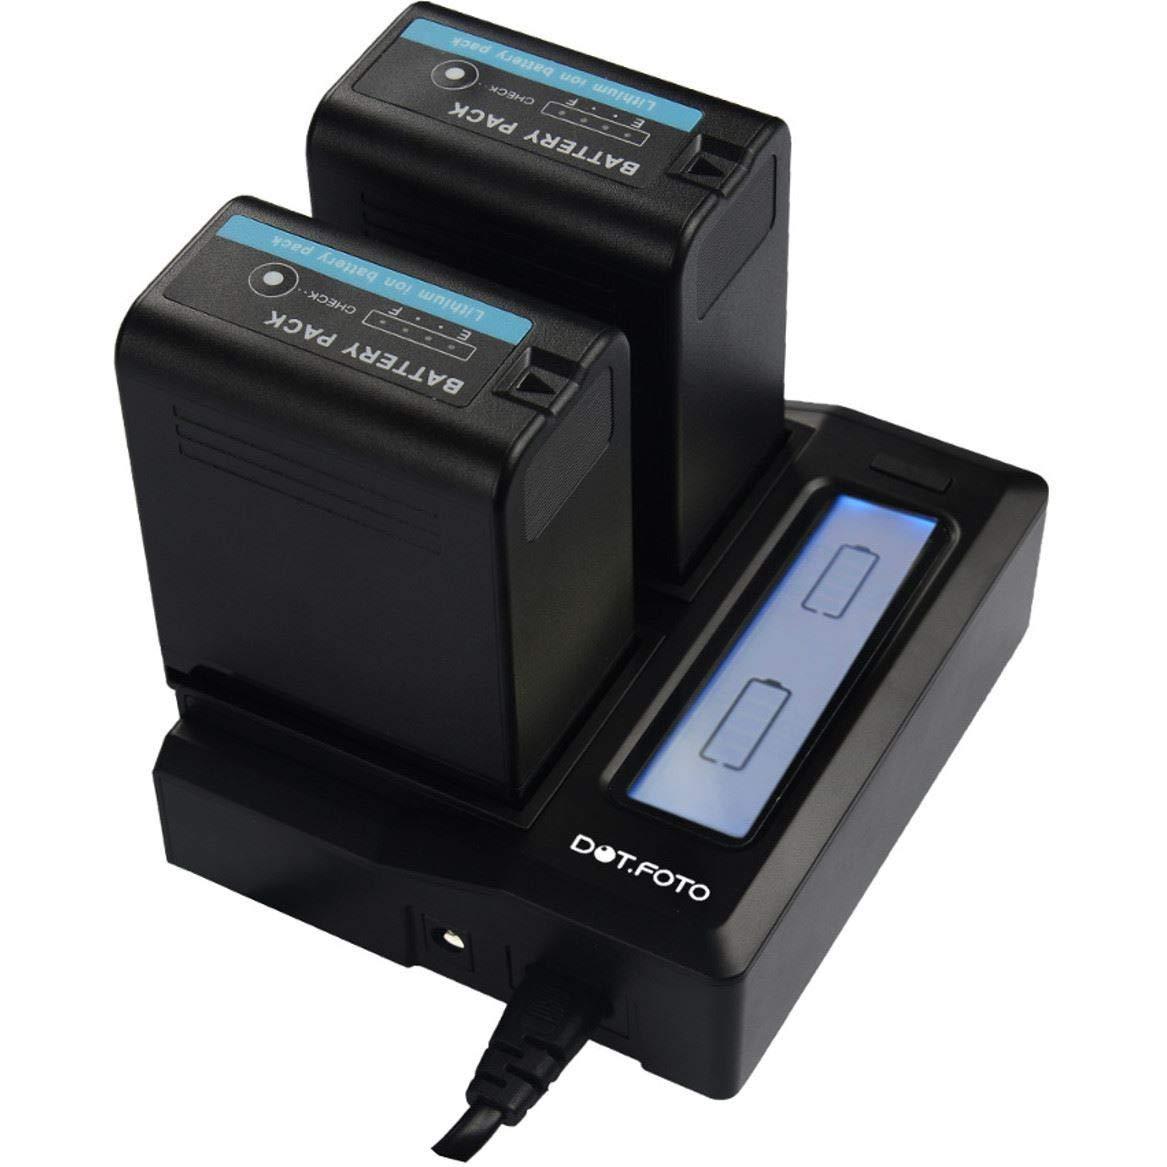 Dot Foto Panasonic CGR-D08S CGR-D16S CGR-D28S CGR-D54S CGR-D110 CGR-D120 CGR-D220 CGR-D320 Dual Battery Charger Mains 12v USB Output See Description for Compatibility